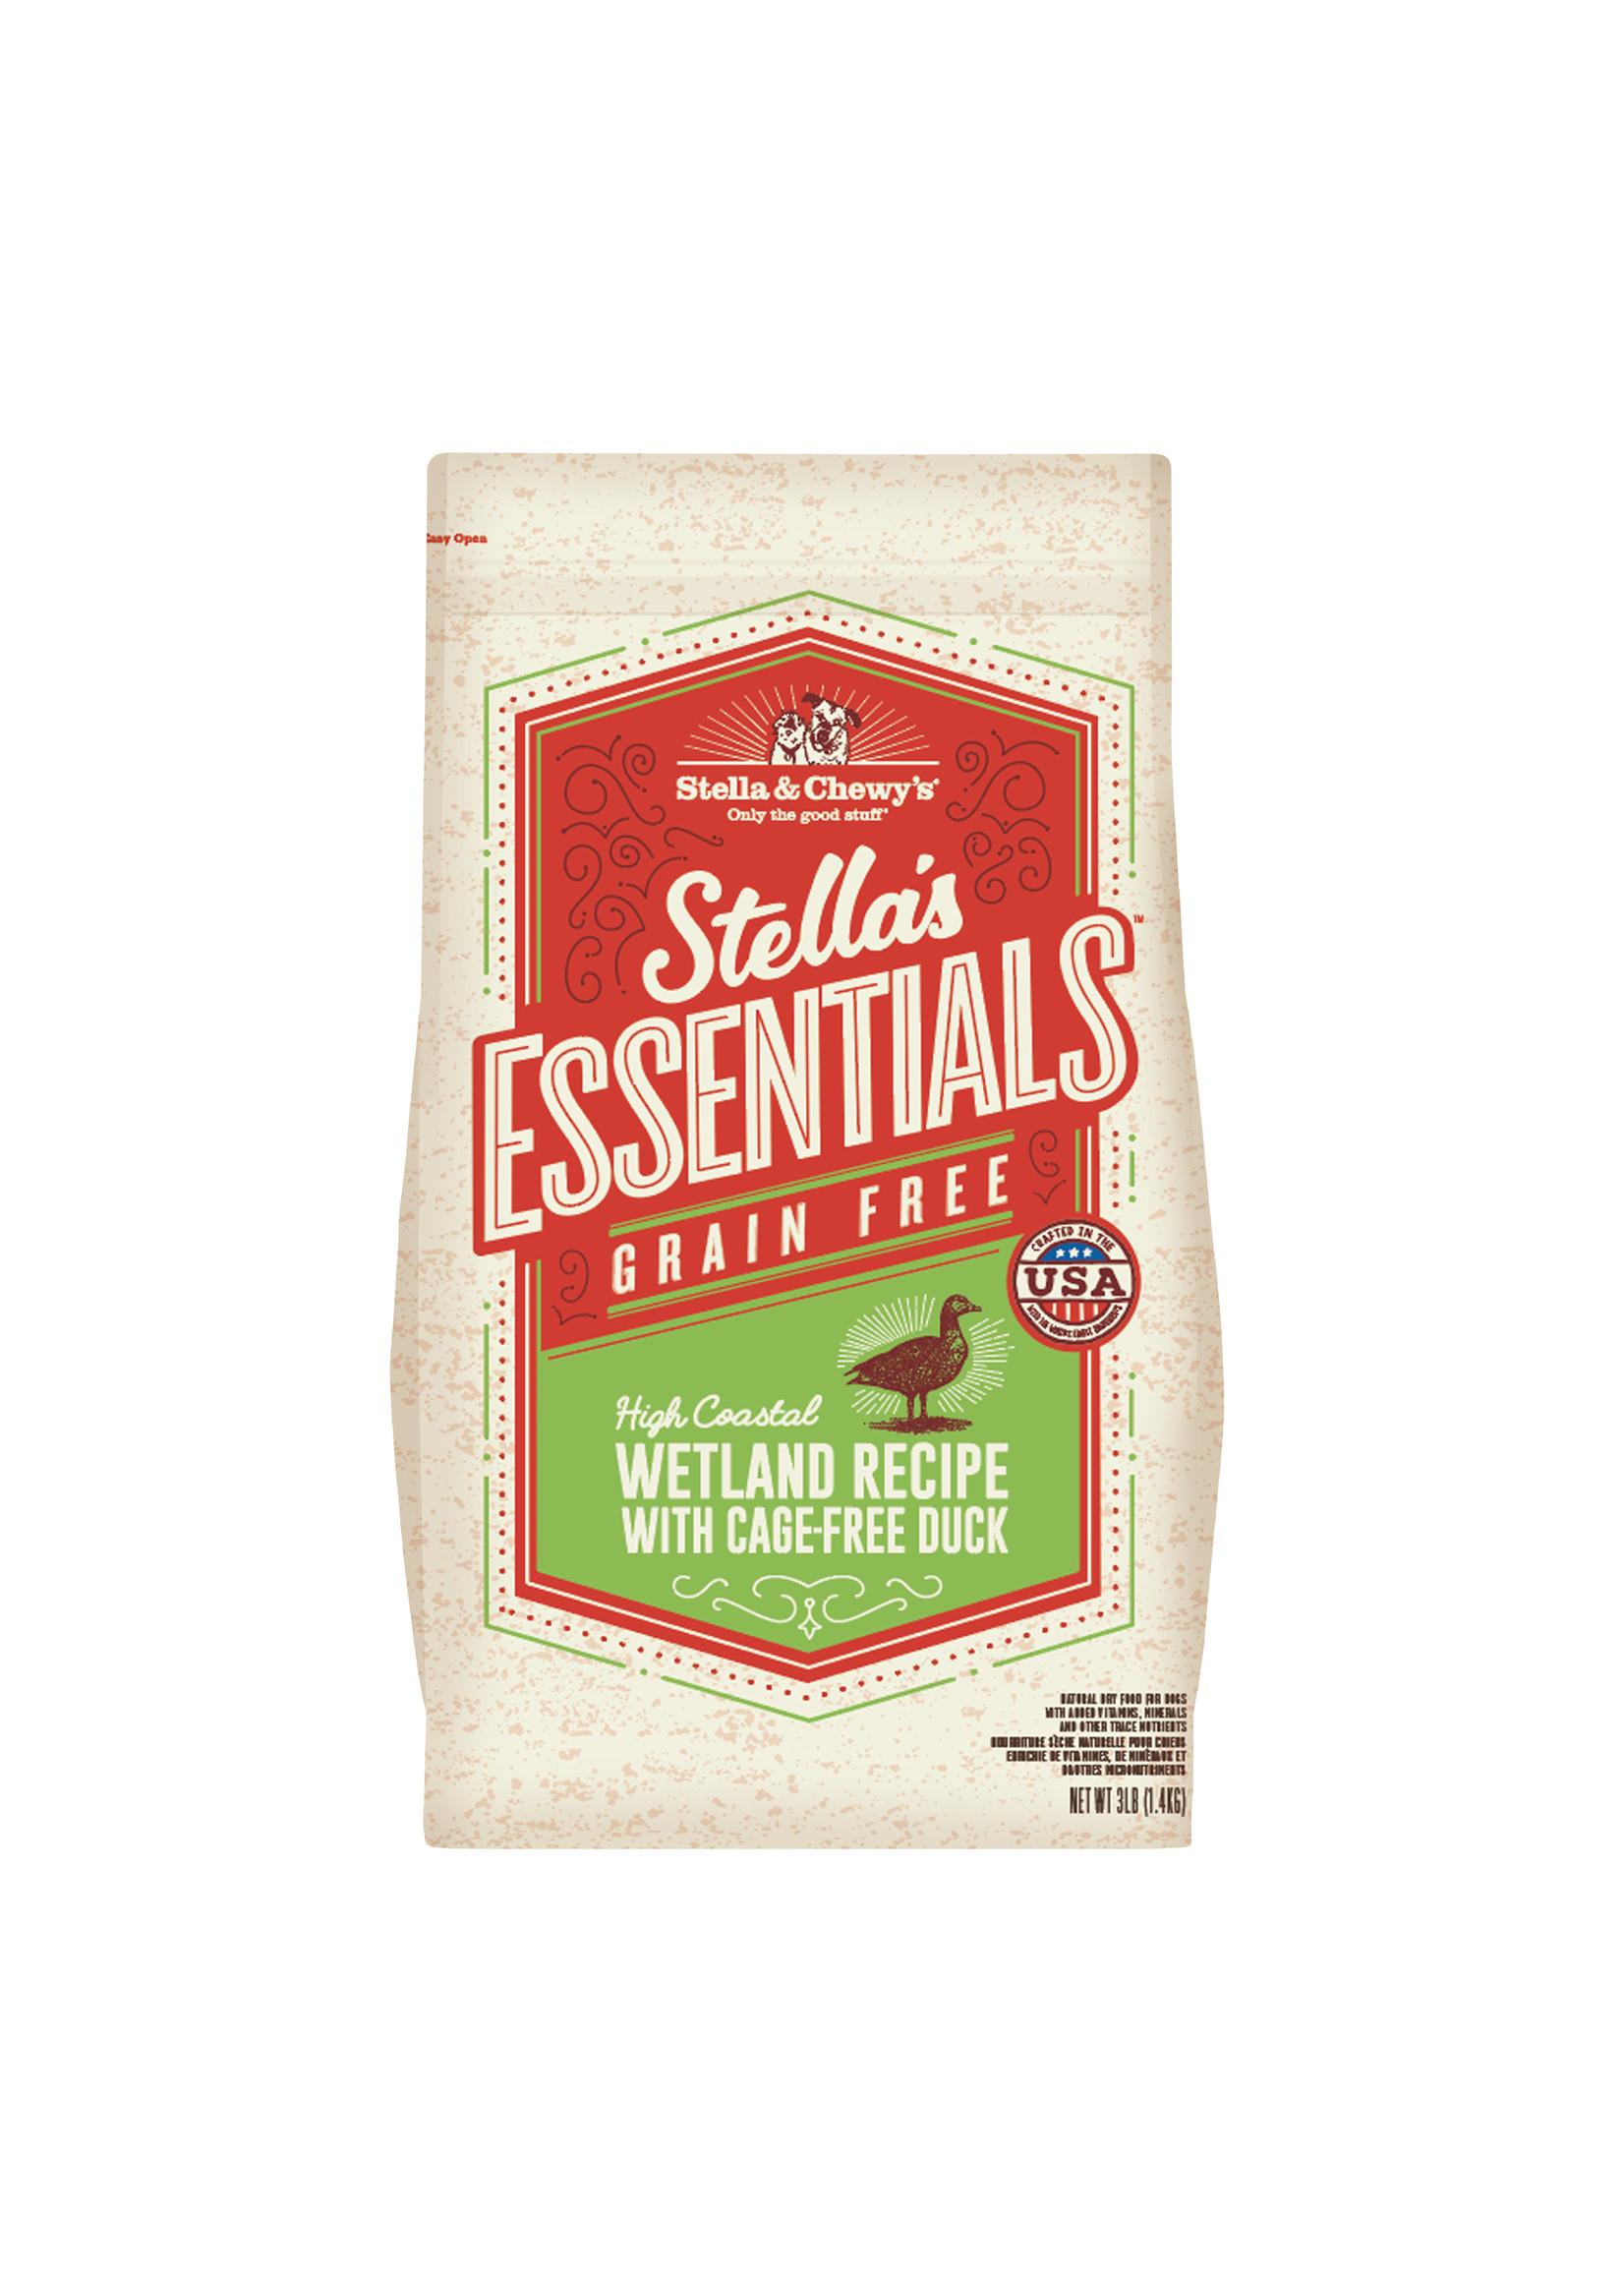 Stella & Chewy's Stella's Essentials Grain-Free Coastal Wetland Duck Recipe